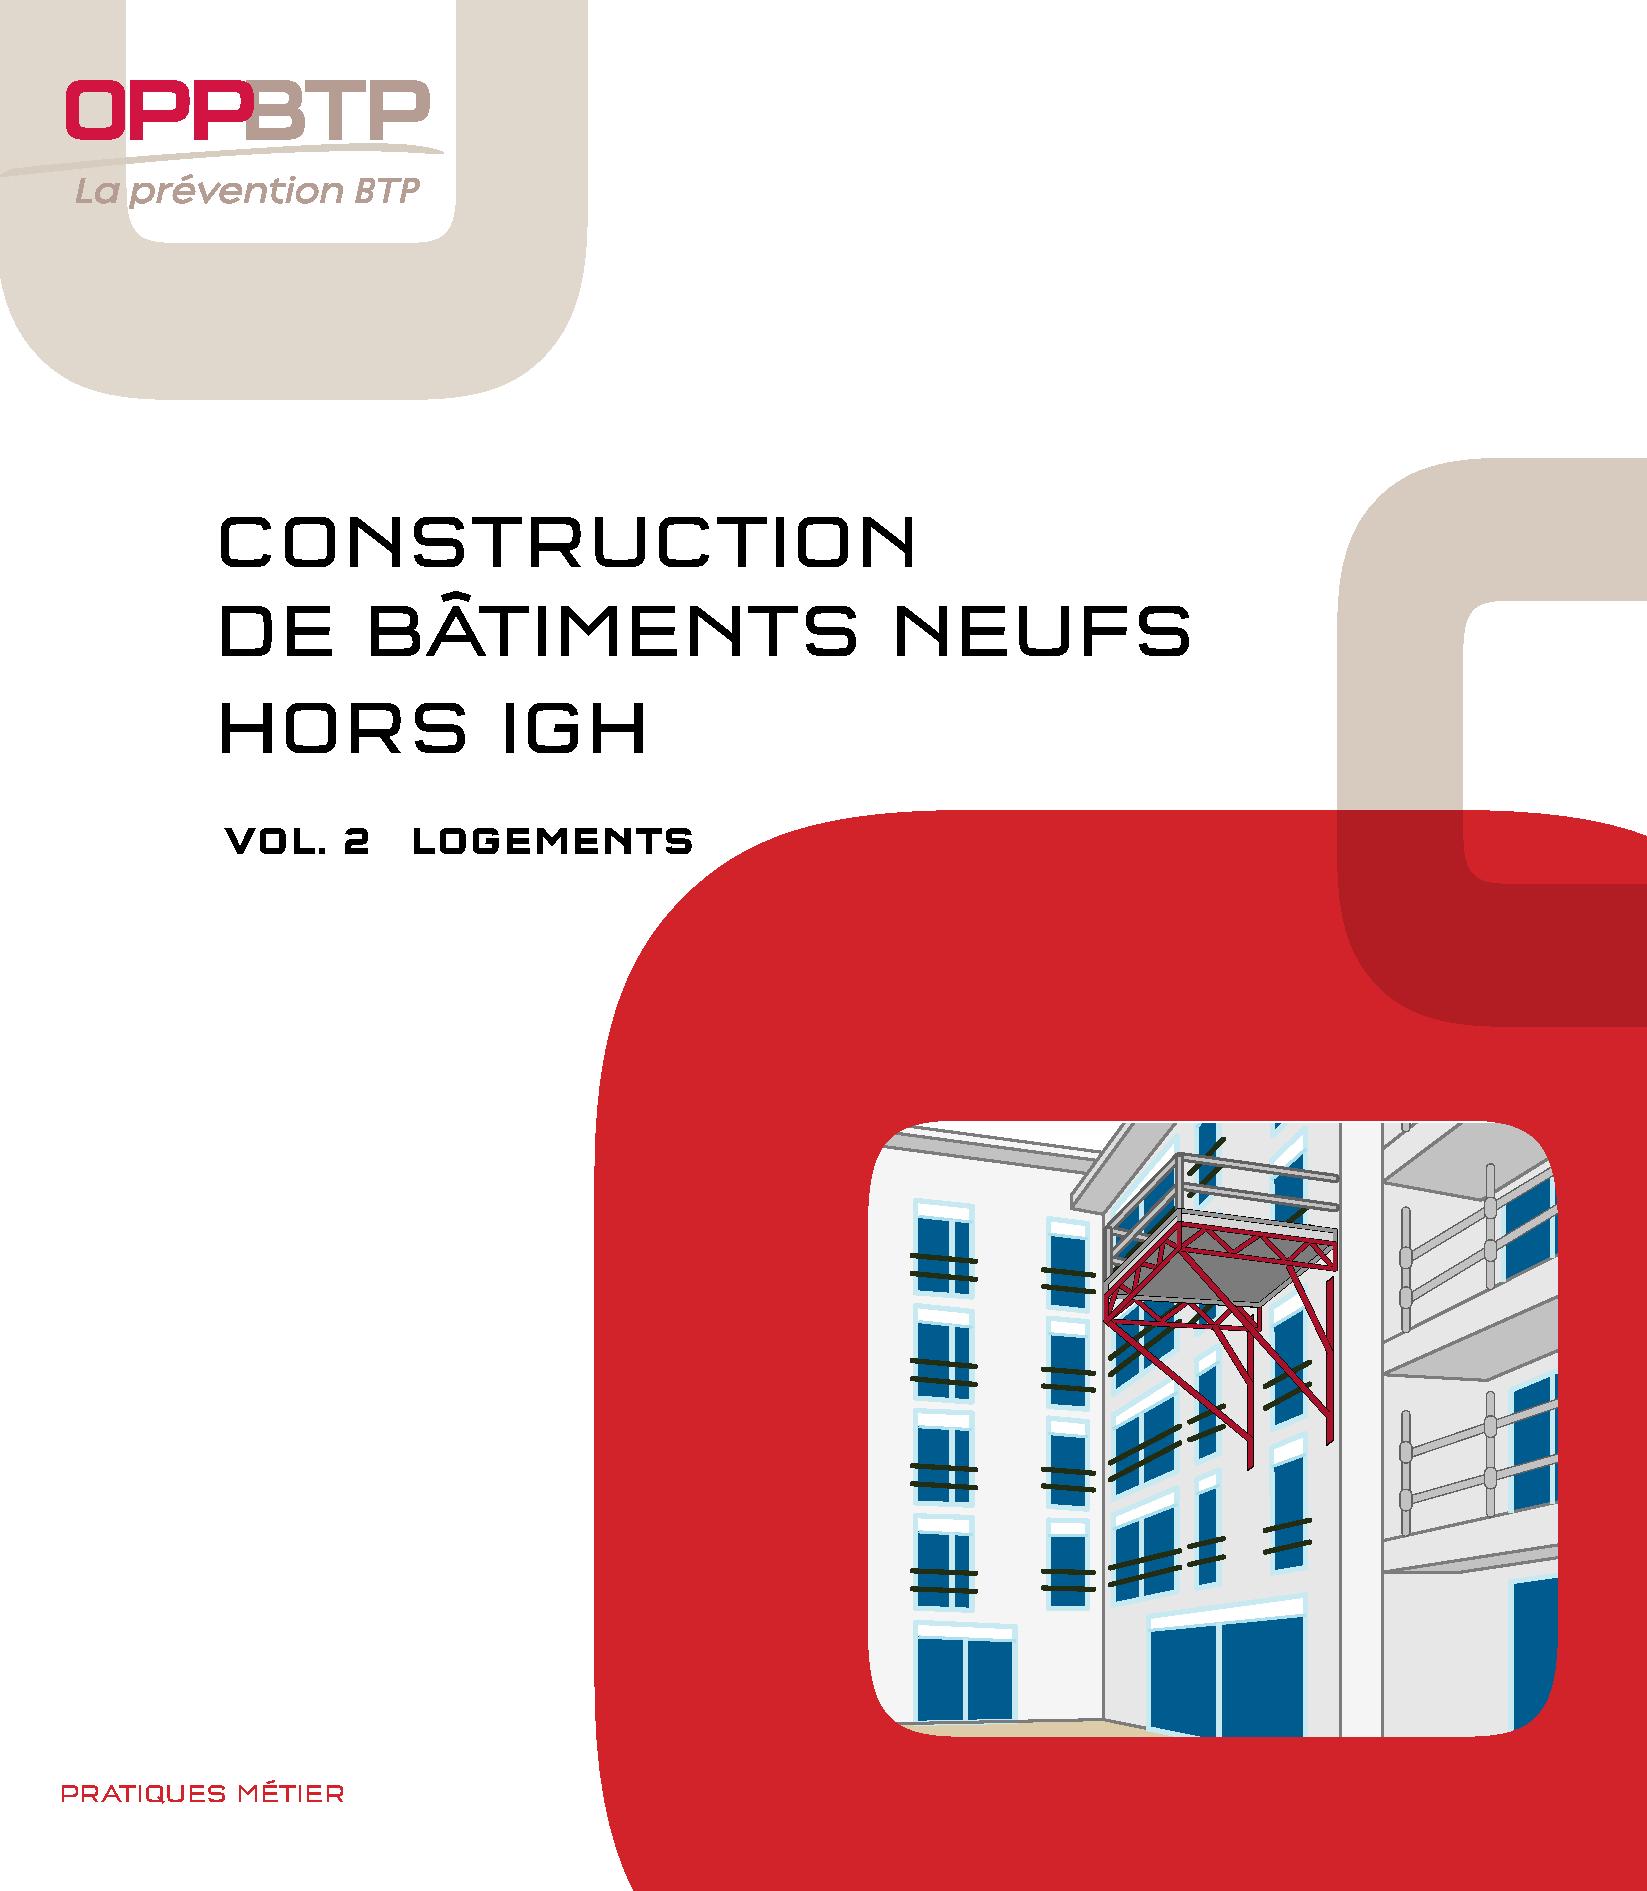 Construction de b timents neufs hors igh vol 2 for Construction de logements neufs